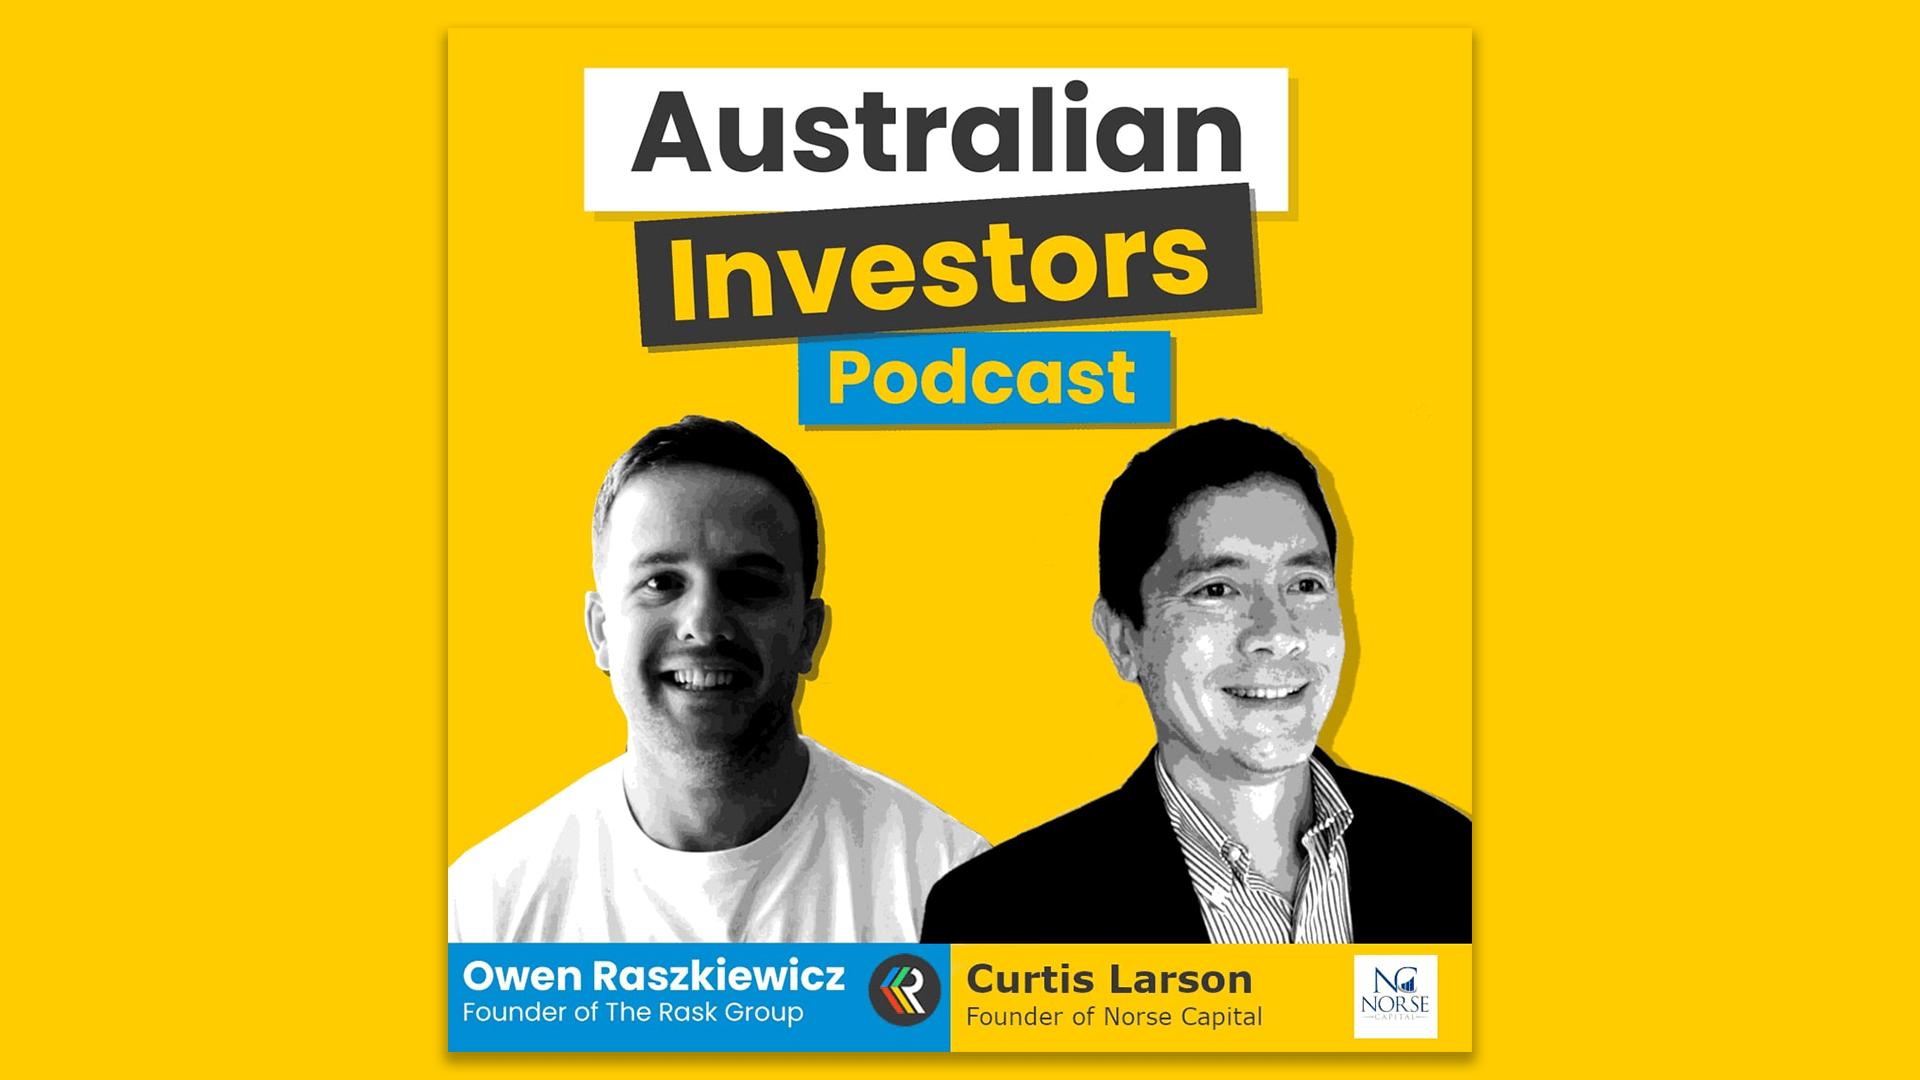 Curtis Larson Australian Investors Podcast